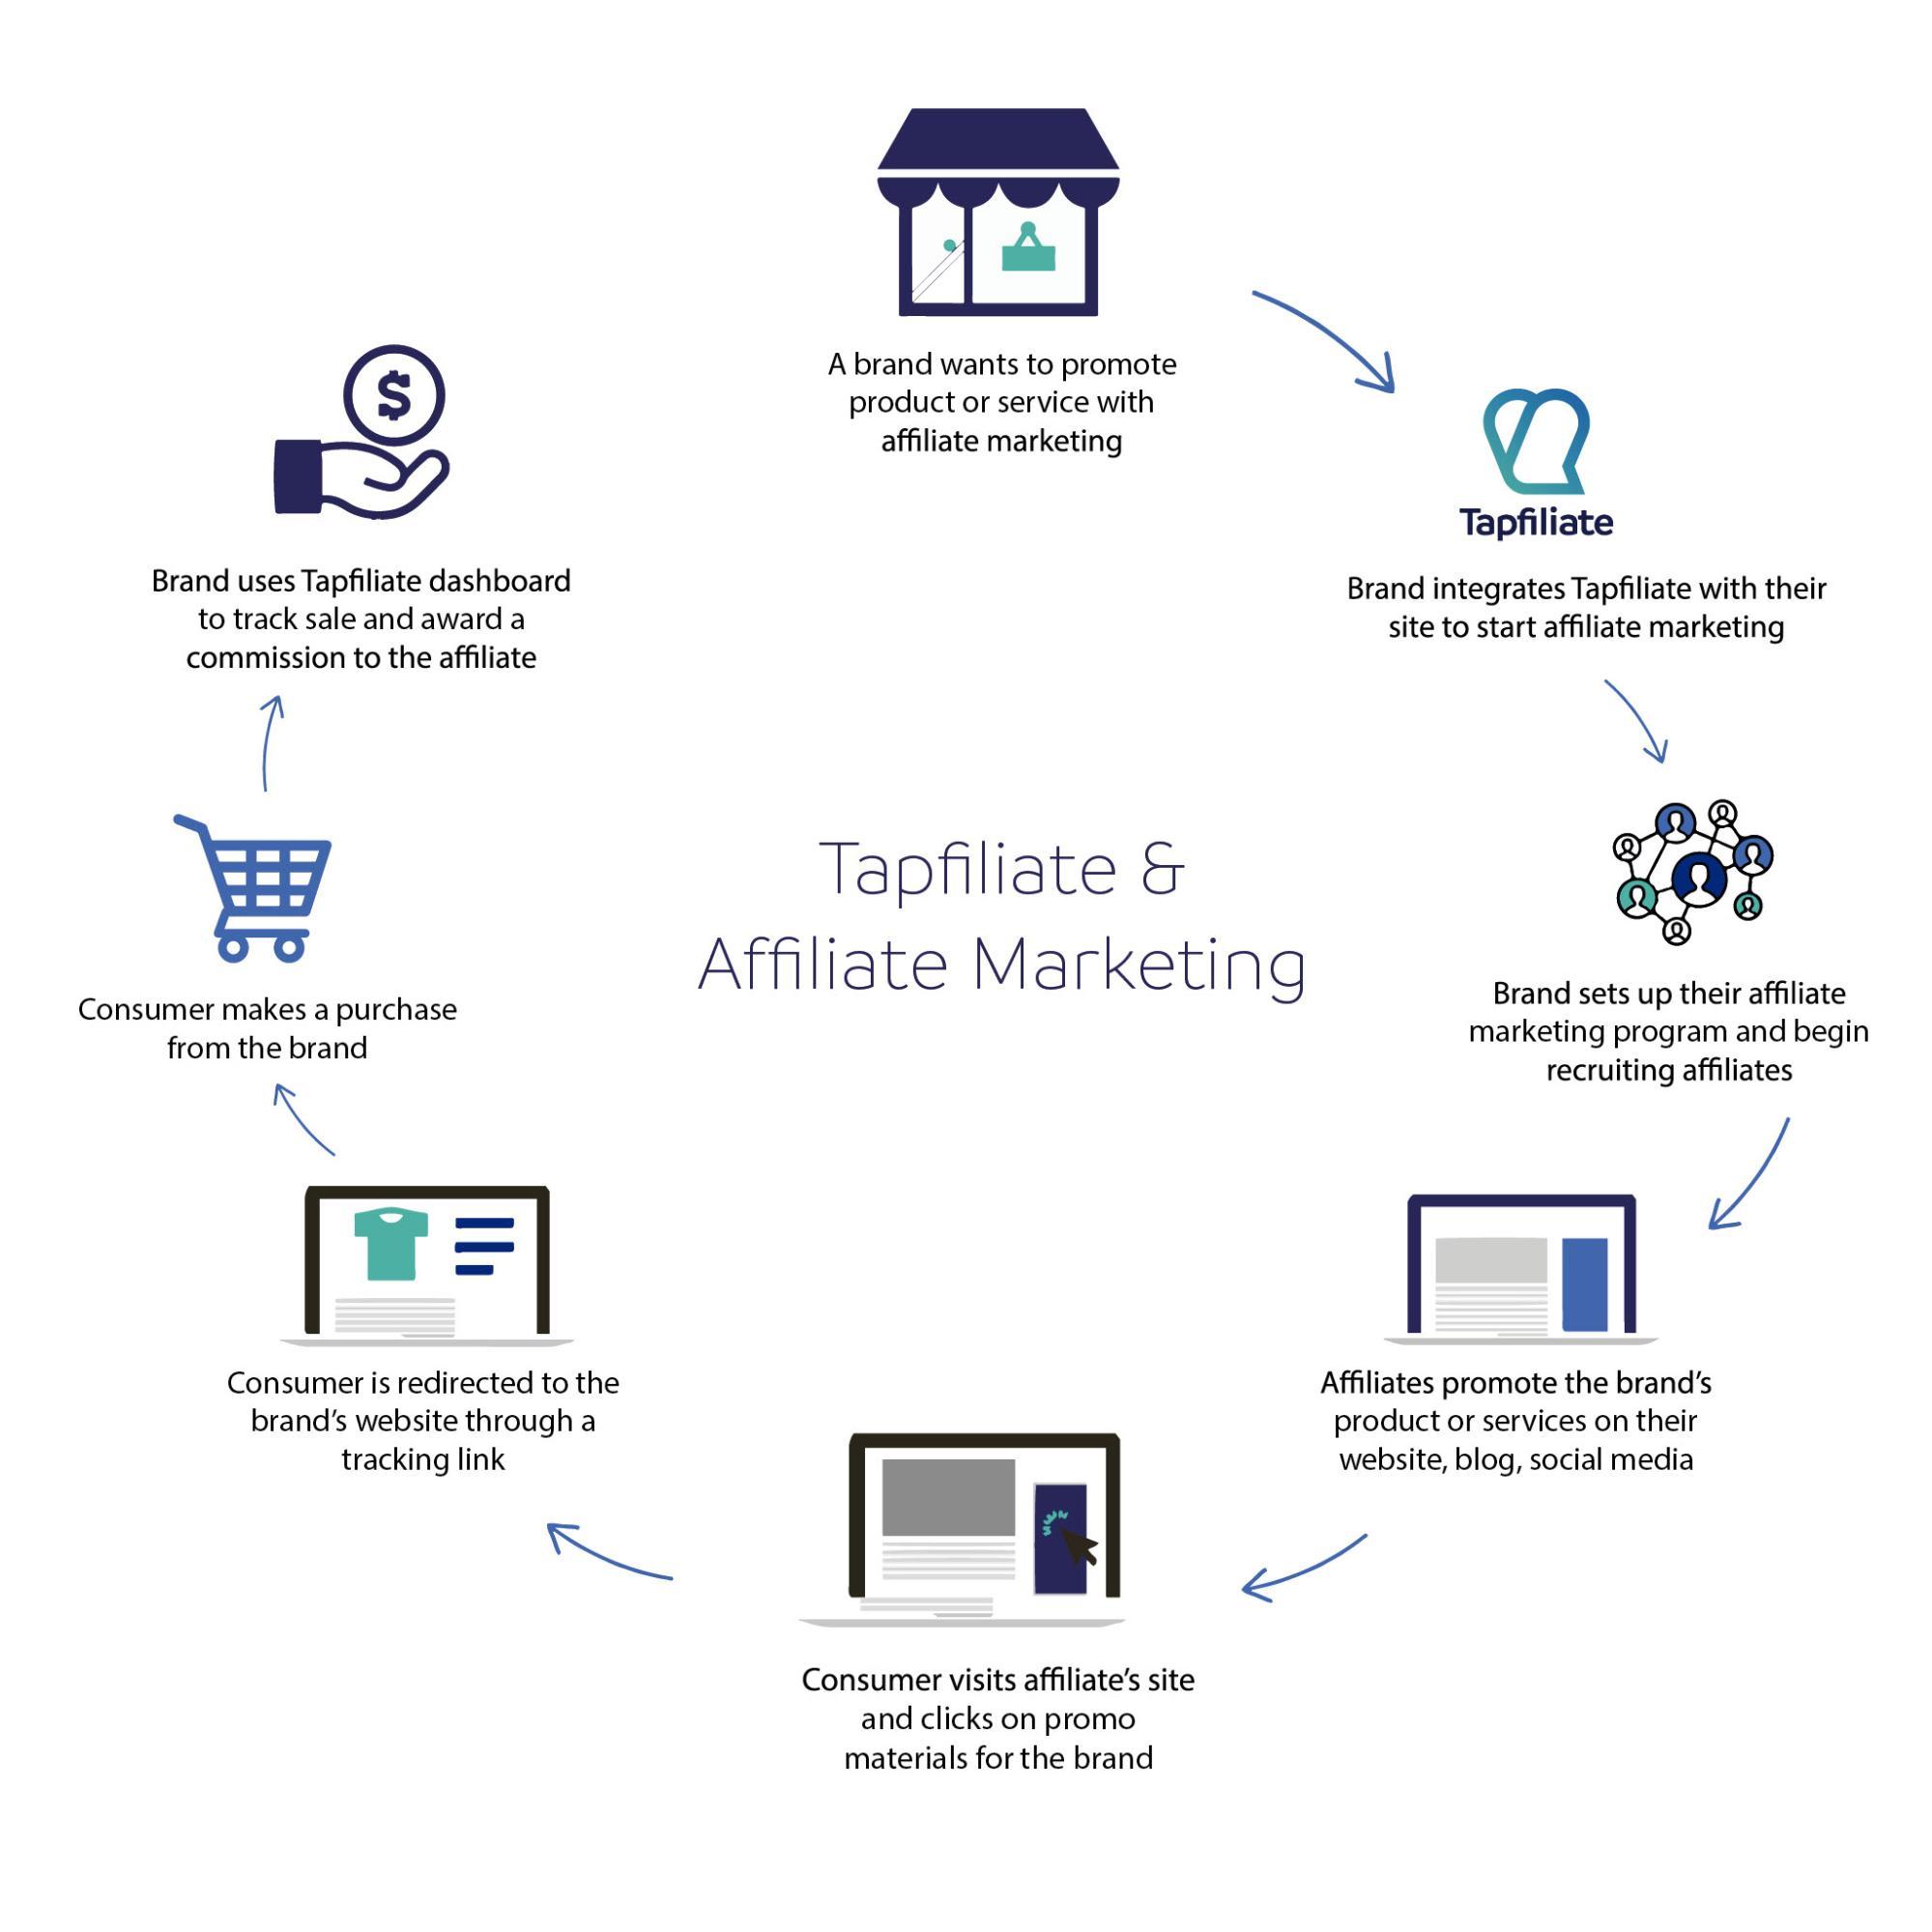 tapfiliate and affiliate marketing